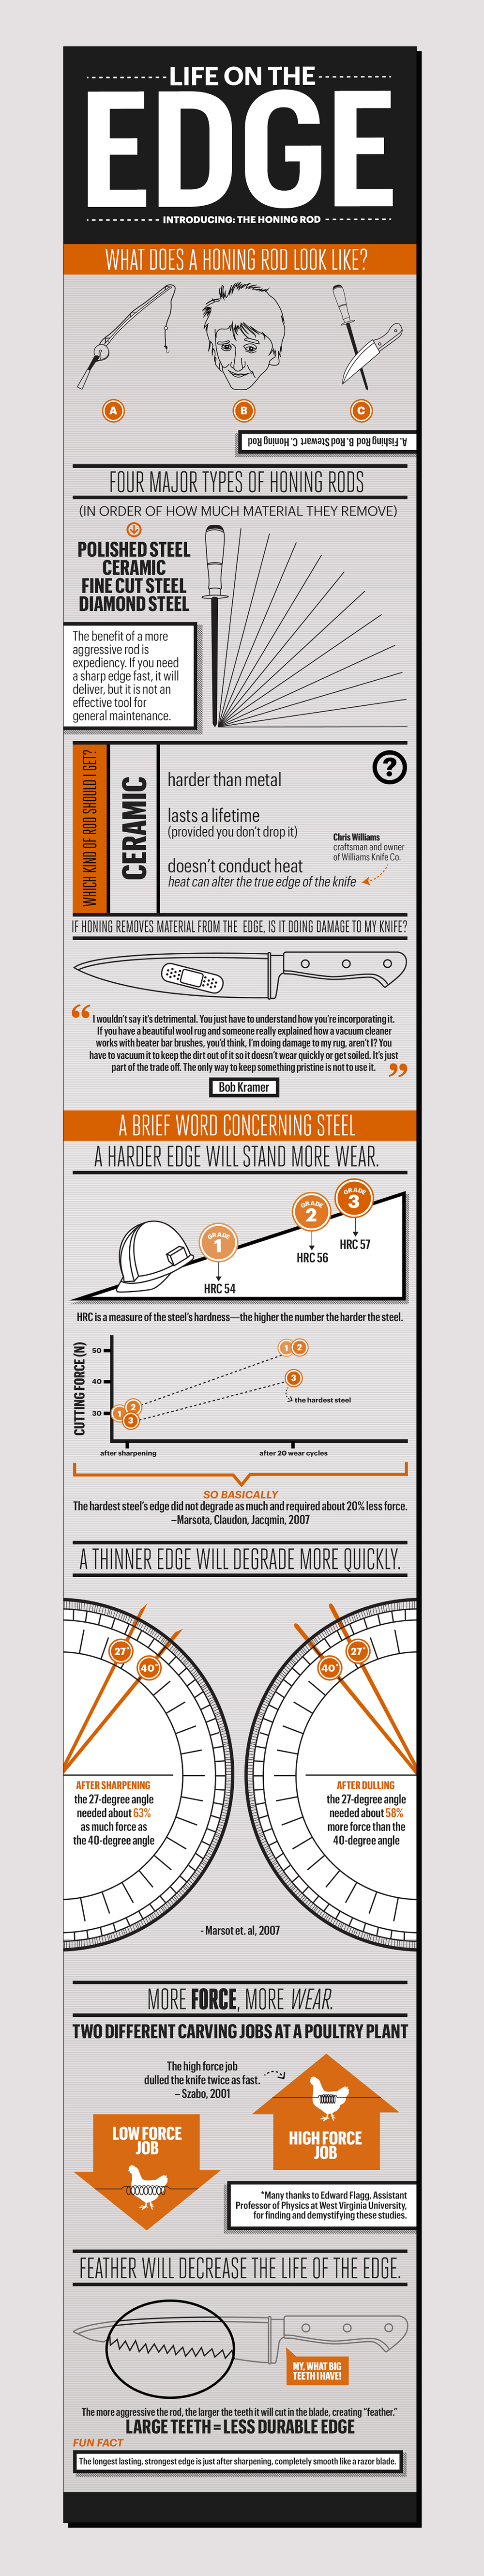 Site-Infographic-HoningRod.jpg